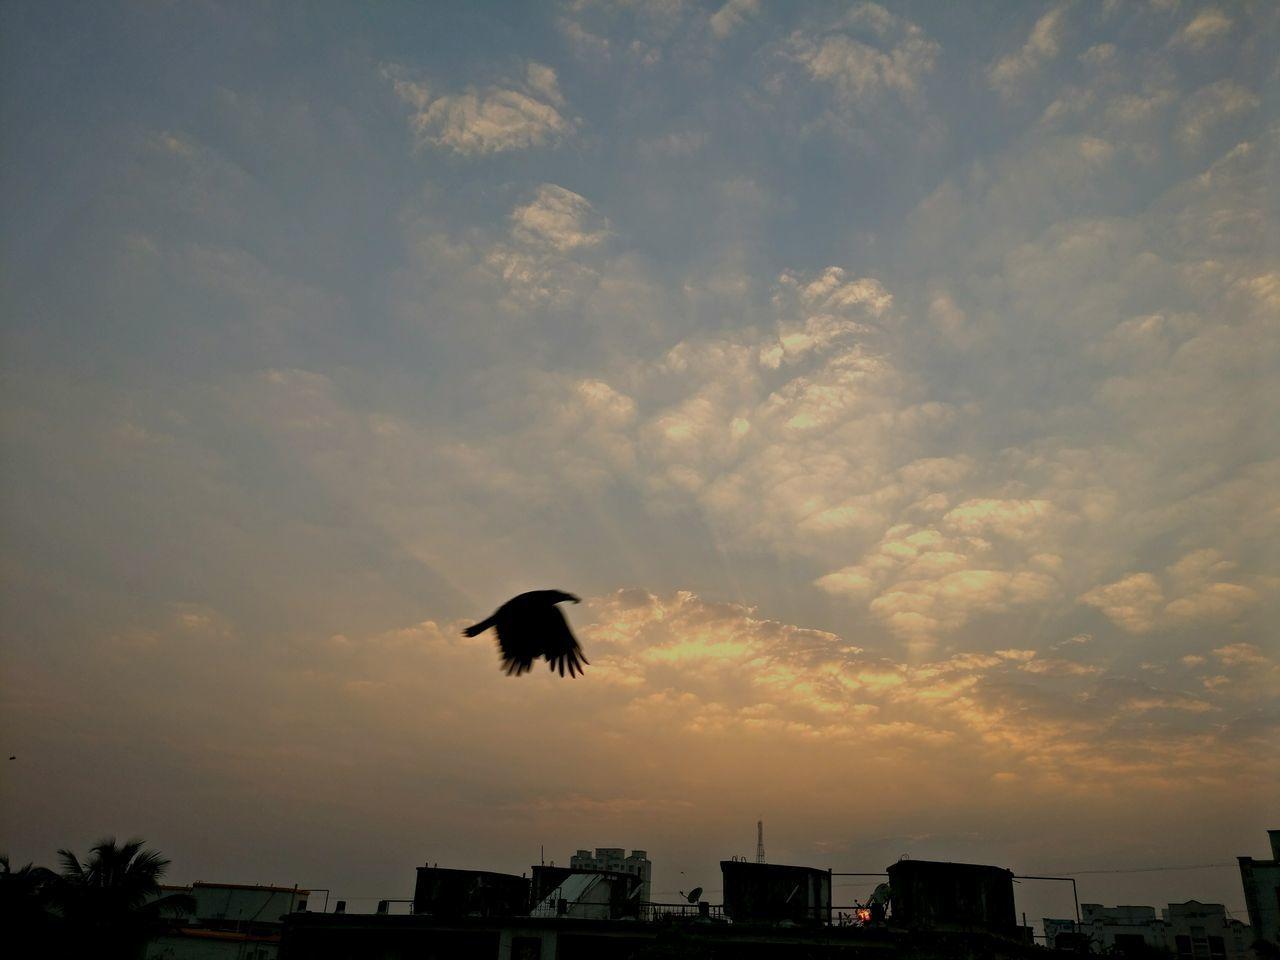 Flying Bird Horizontal Outdoors Spread Wings Airplane Sky Day Dusky Sky sunset #sun #clouds #skylovers #sky #nature #beautifulinnature #naturalbeauty photography landscape EyeEm Birds